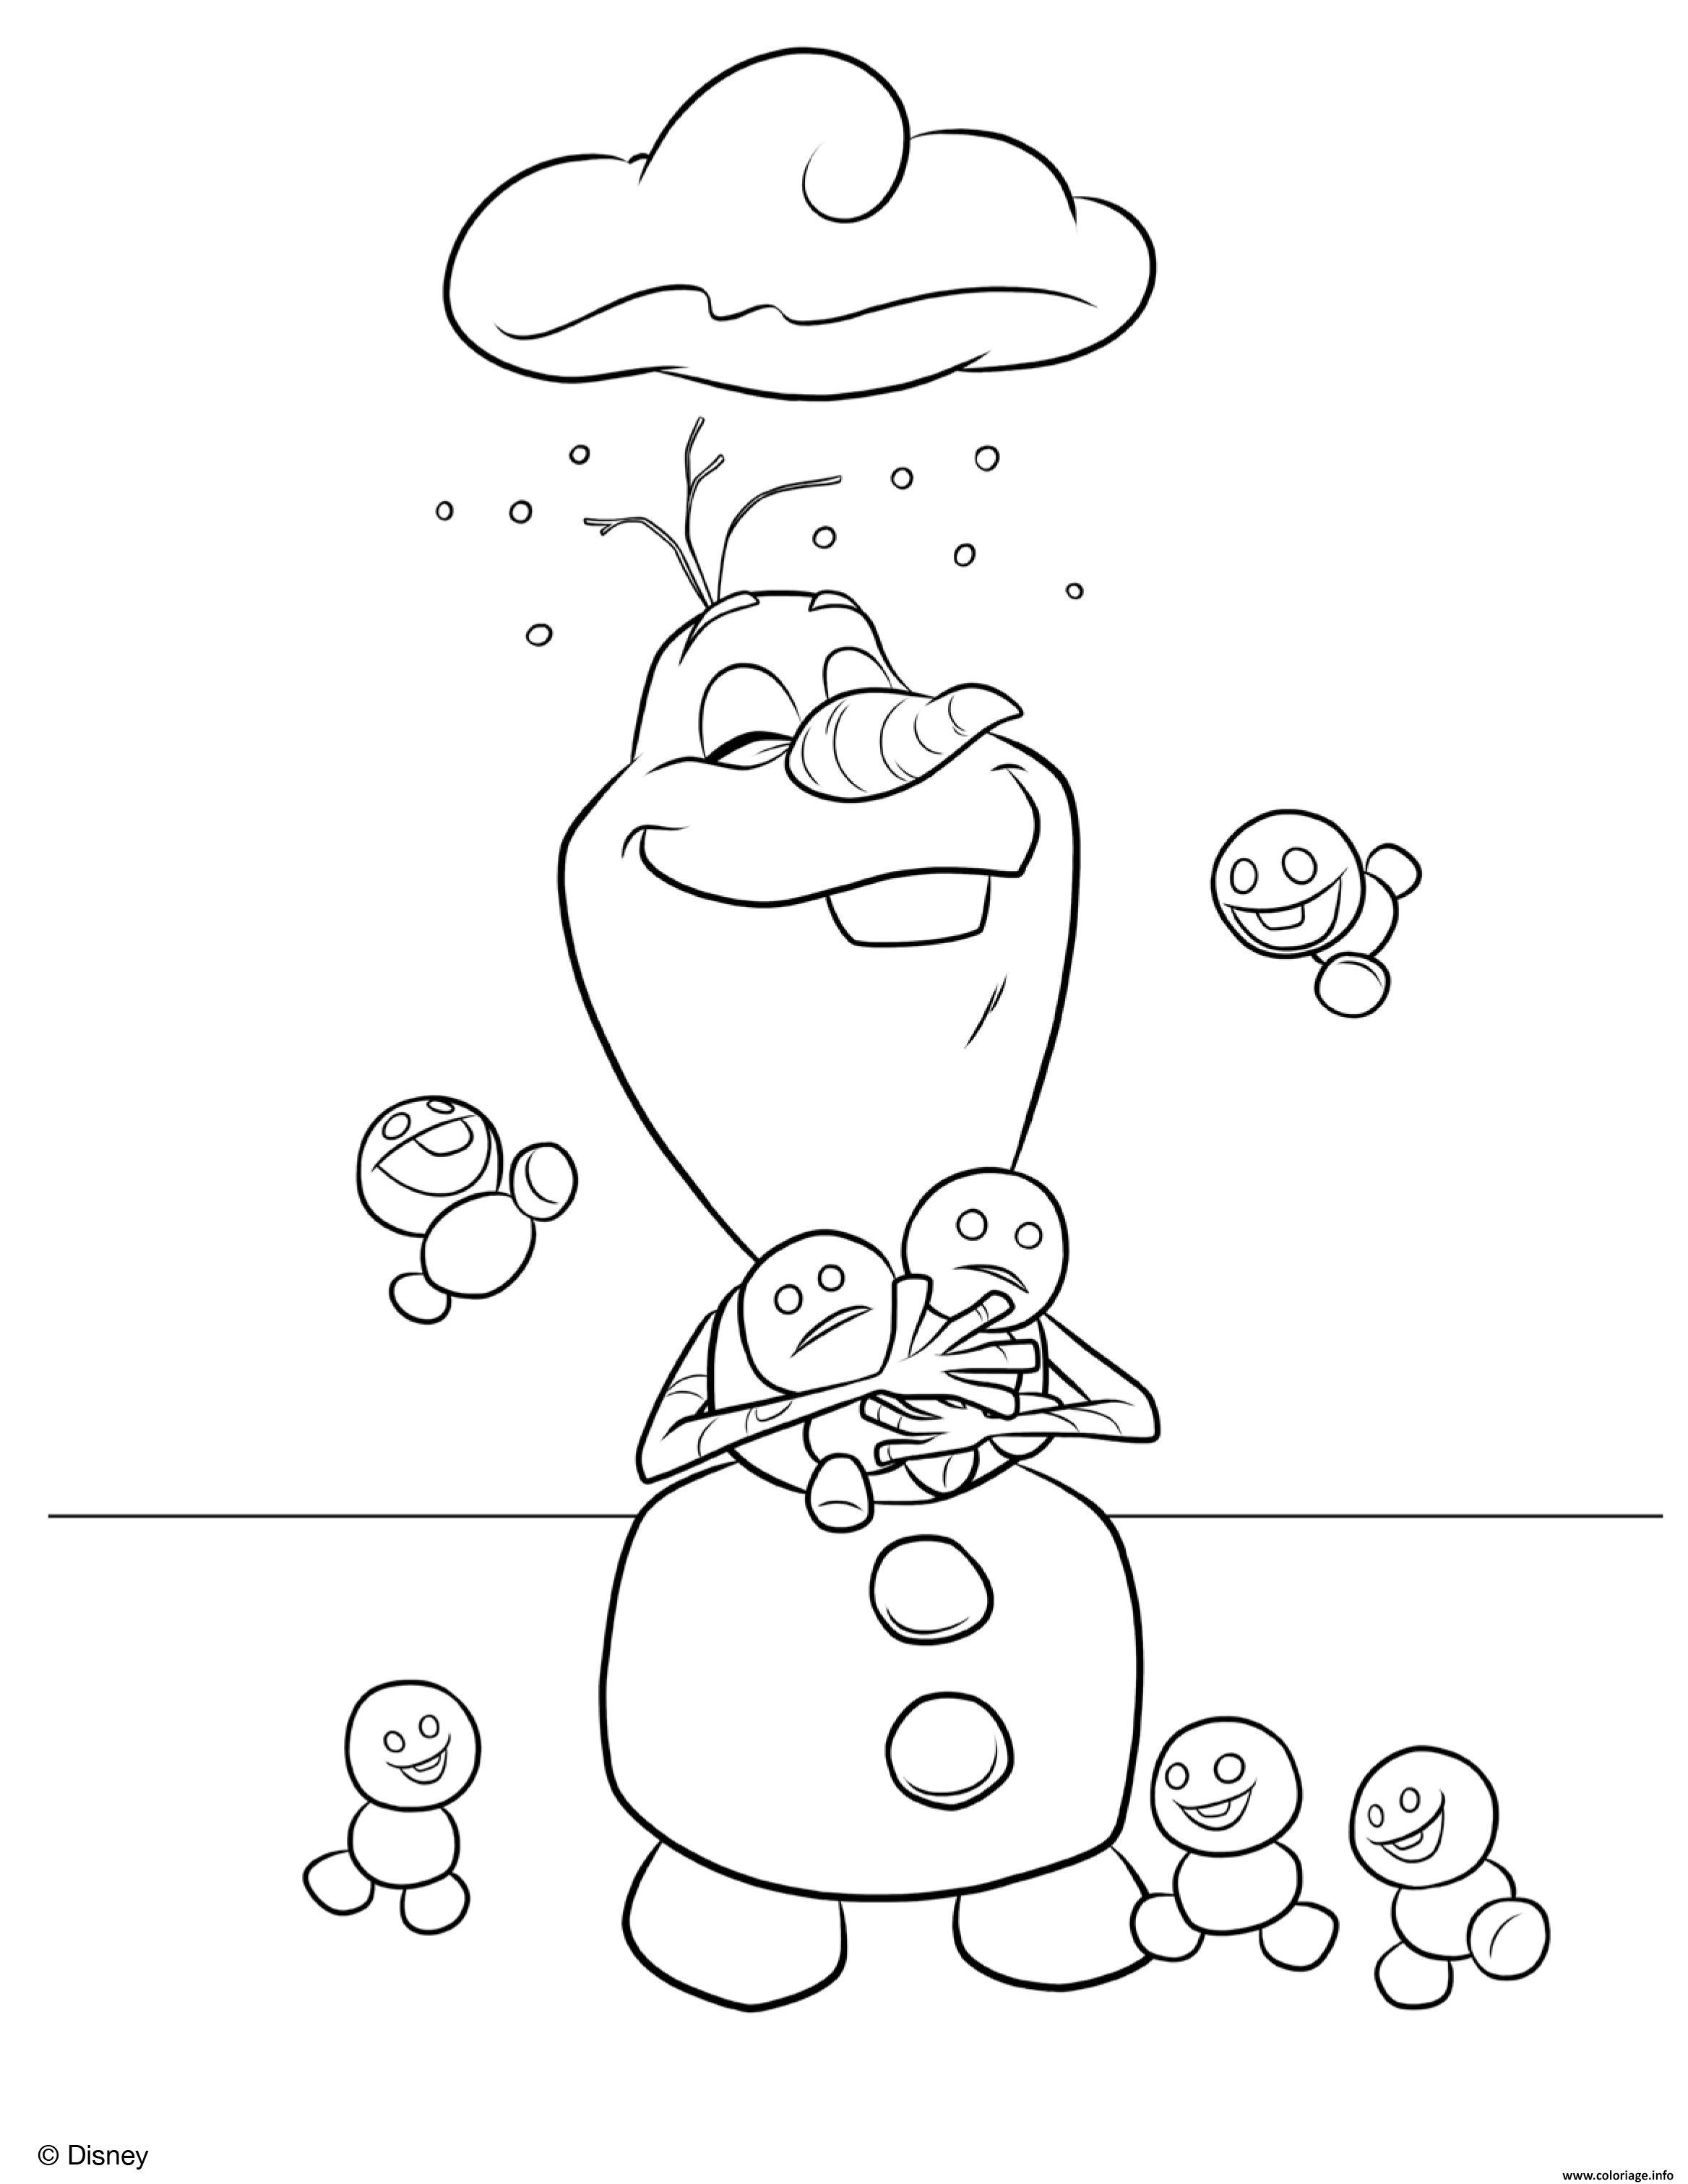 Coloriage Olaf.Coloriage Olaf Est Cool Et Aime La Neige Jecolorie Com